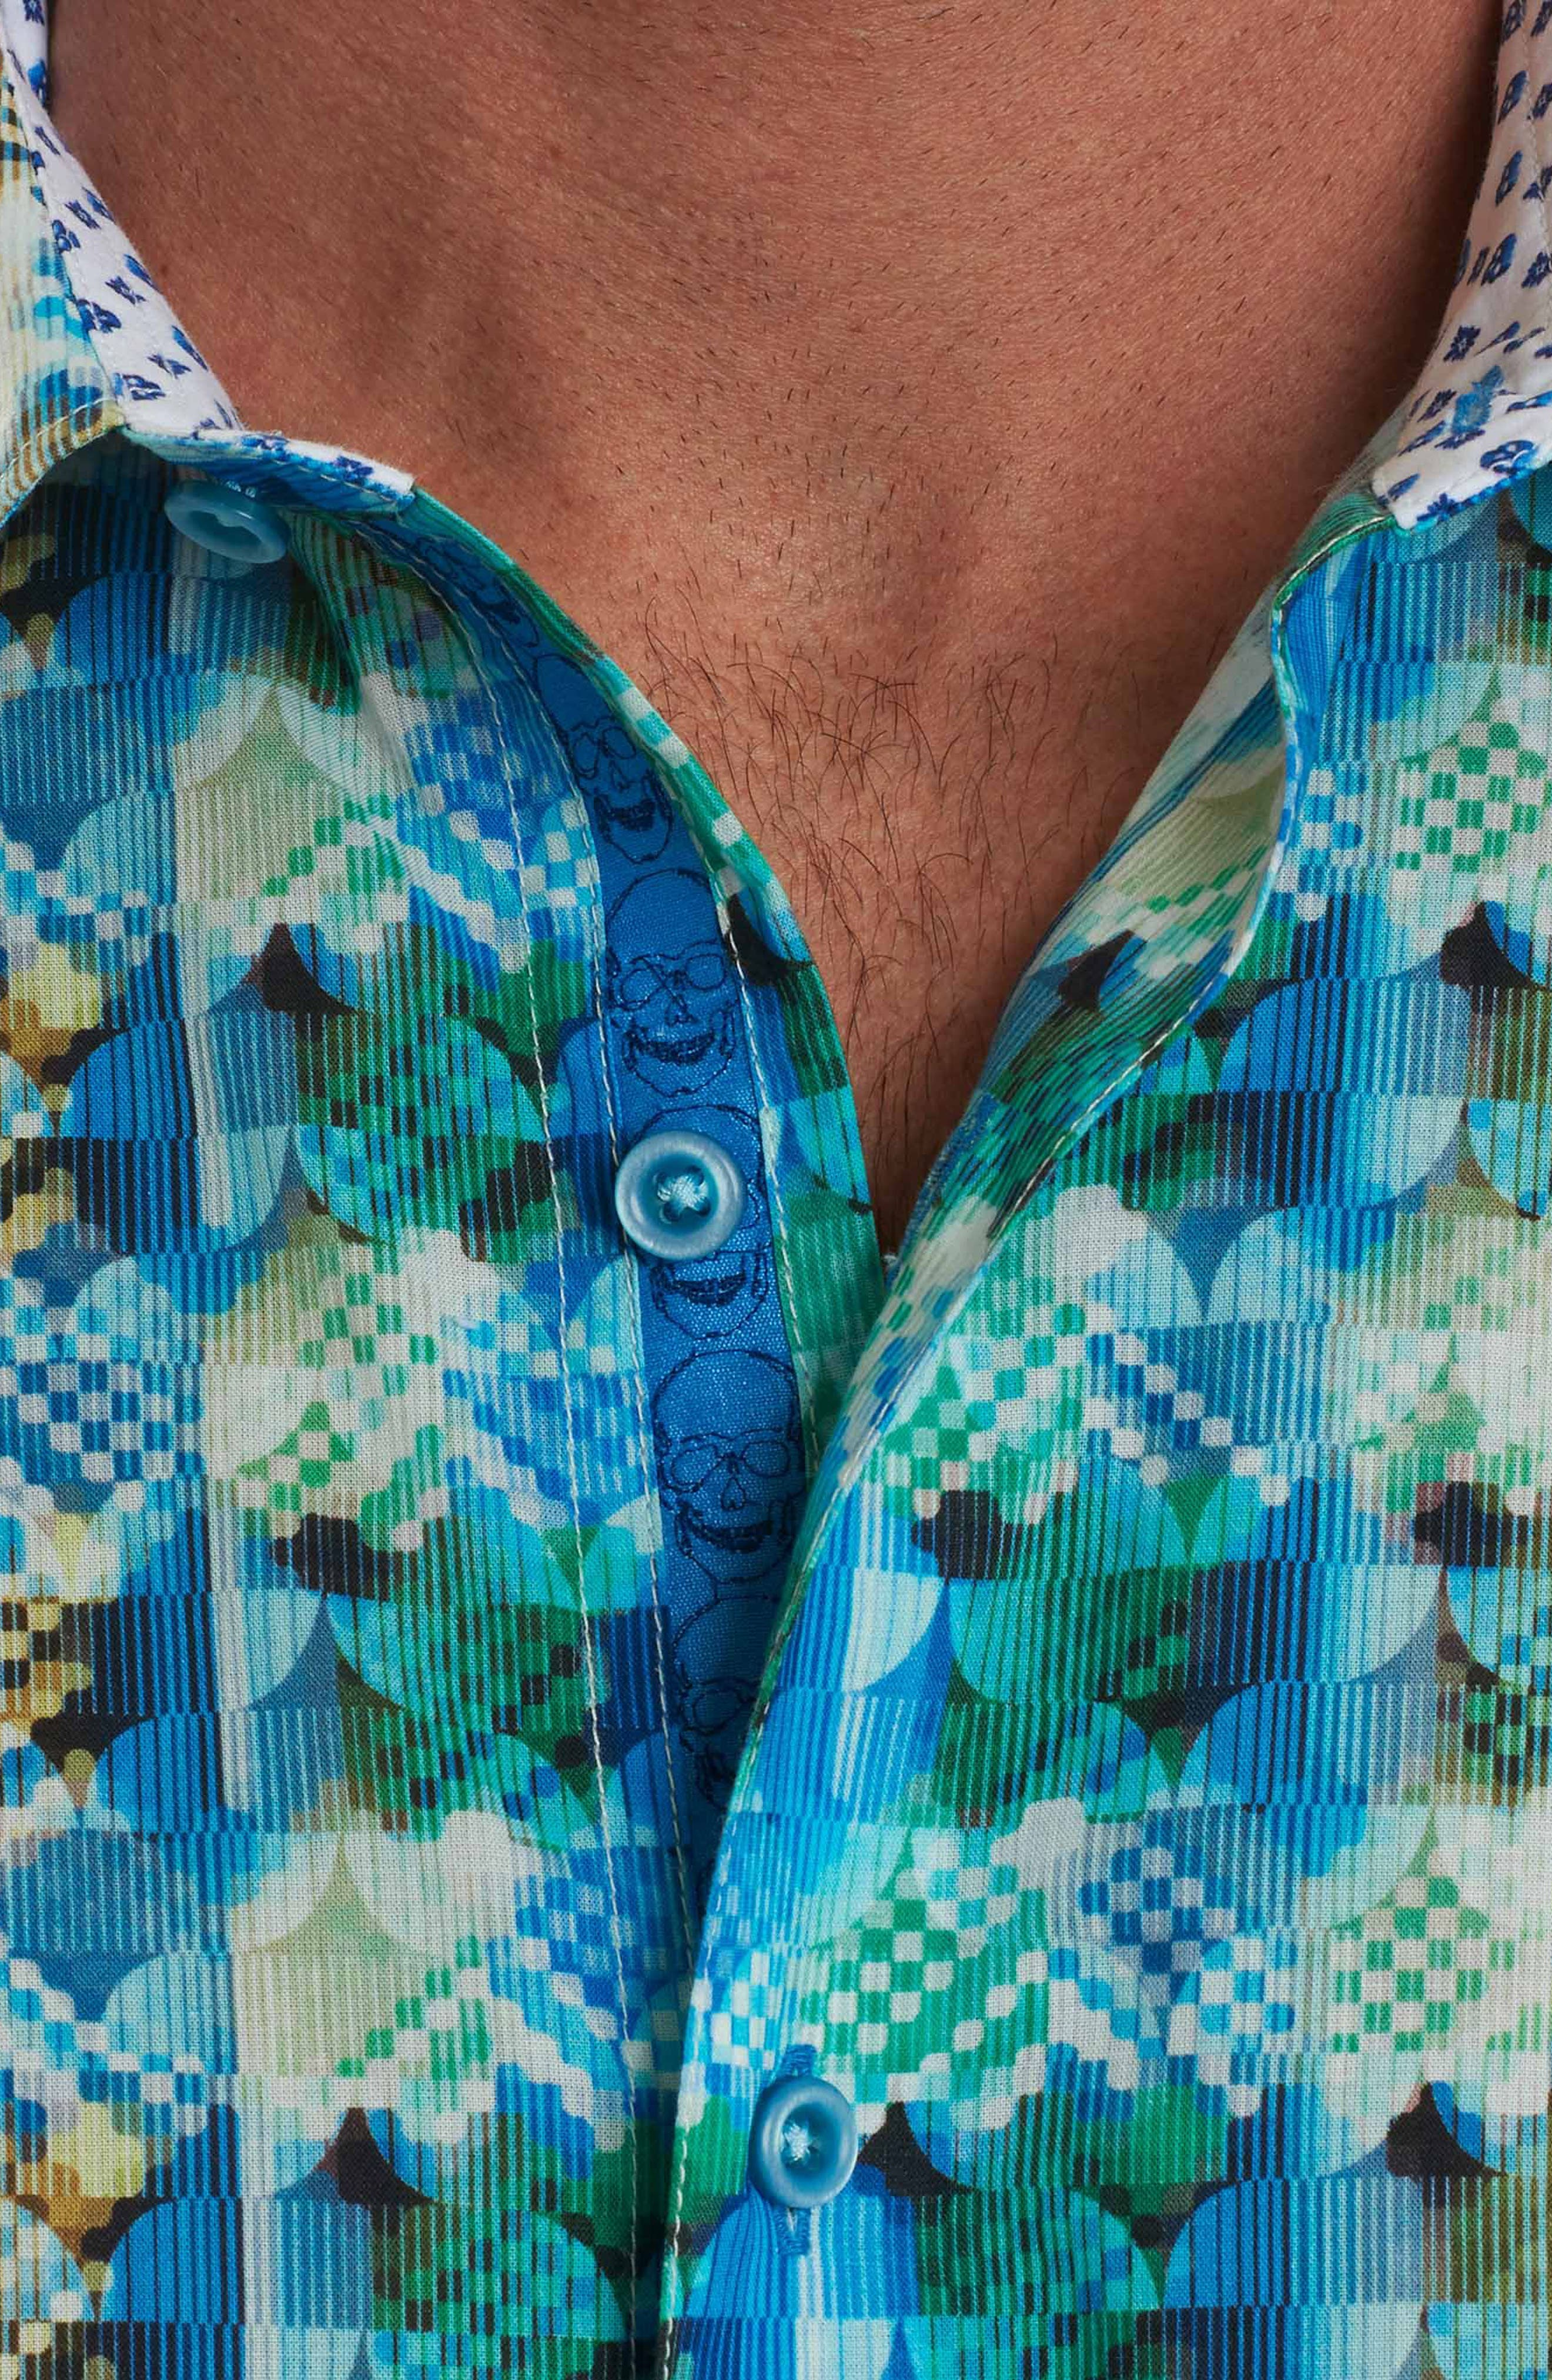 Illusions Sport Shirt,                             Alternate thumbnail 4, color,                             Turquoise